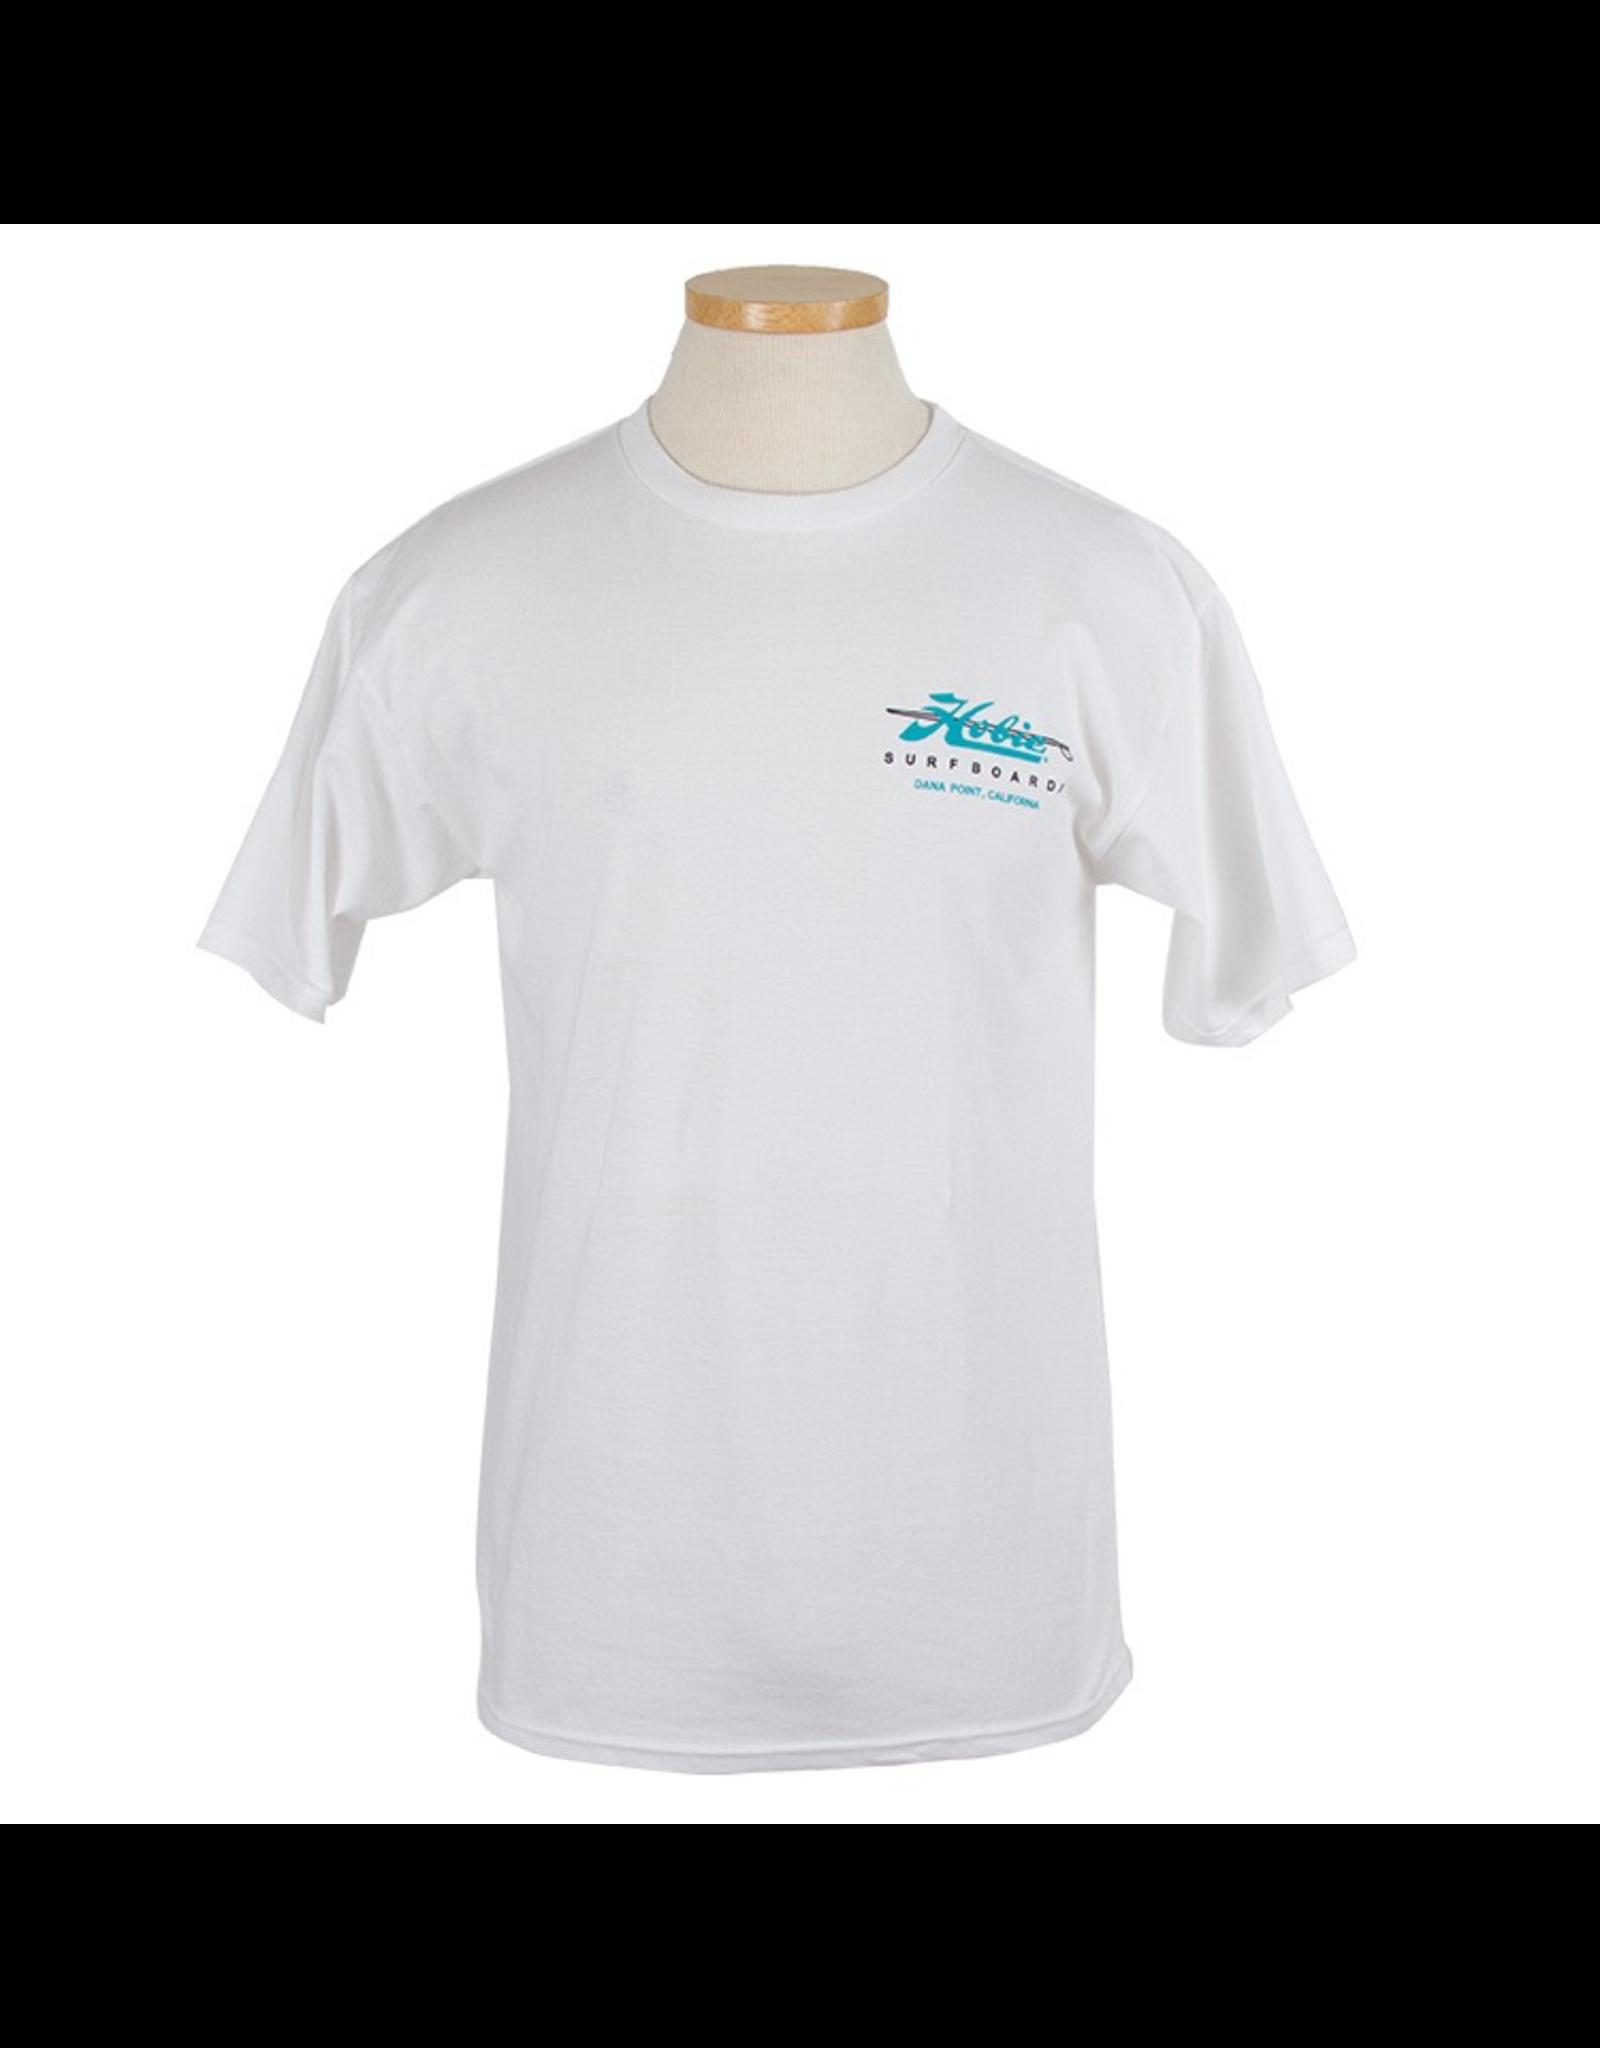 Hobie Hobie Classic White T-shirt, Short Sleeve, Surboards